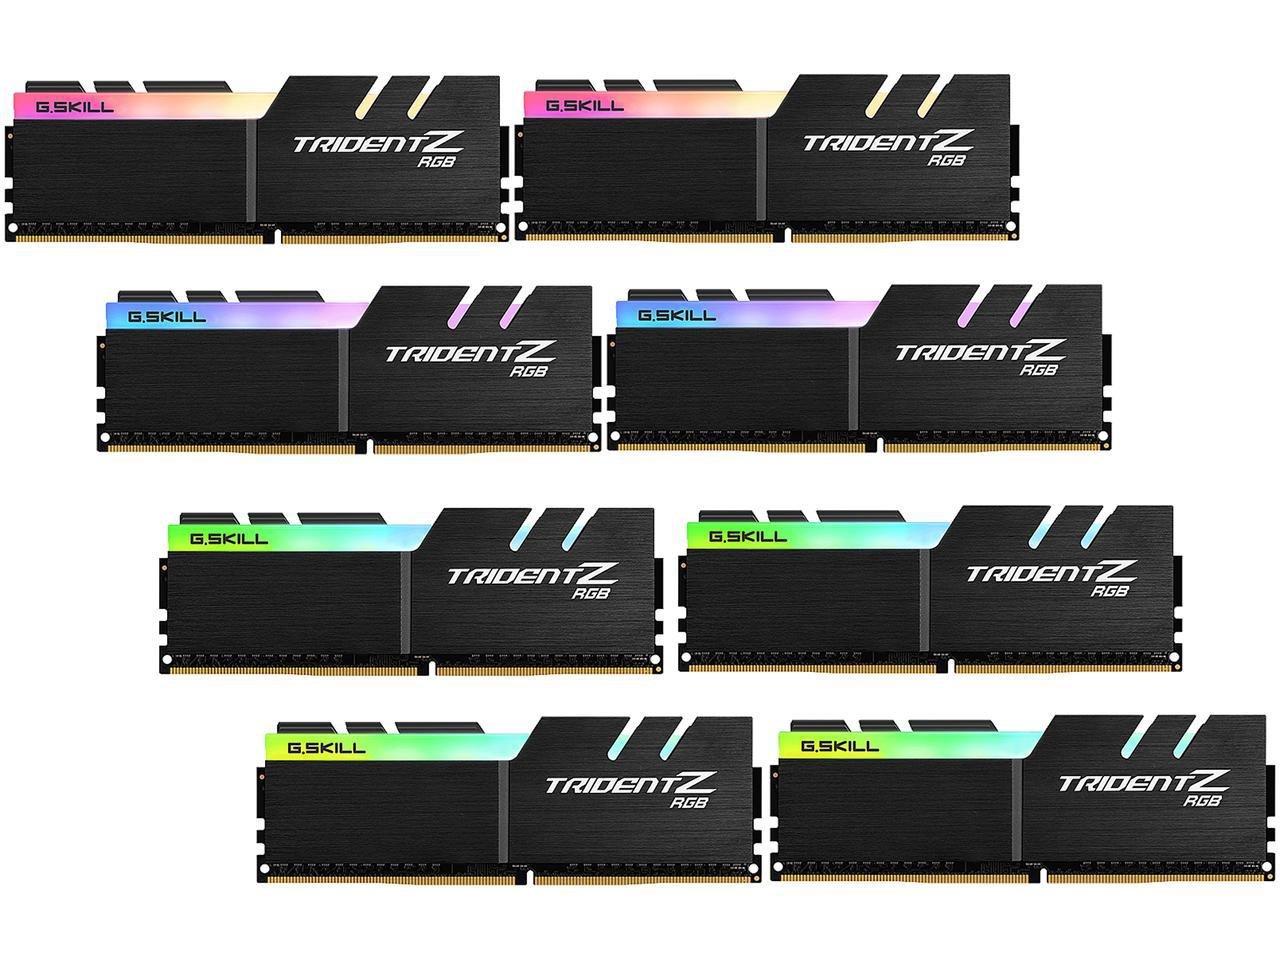 G.SKILL TridentZ RGB Series 128GB (8 x 16GB) 288-Pin DDR4 3333MHz DIMM F4-3333C16Q2-128GTZR by G.Skill (Image #1)